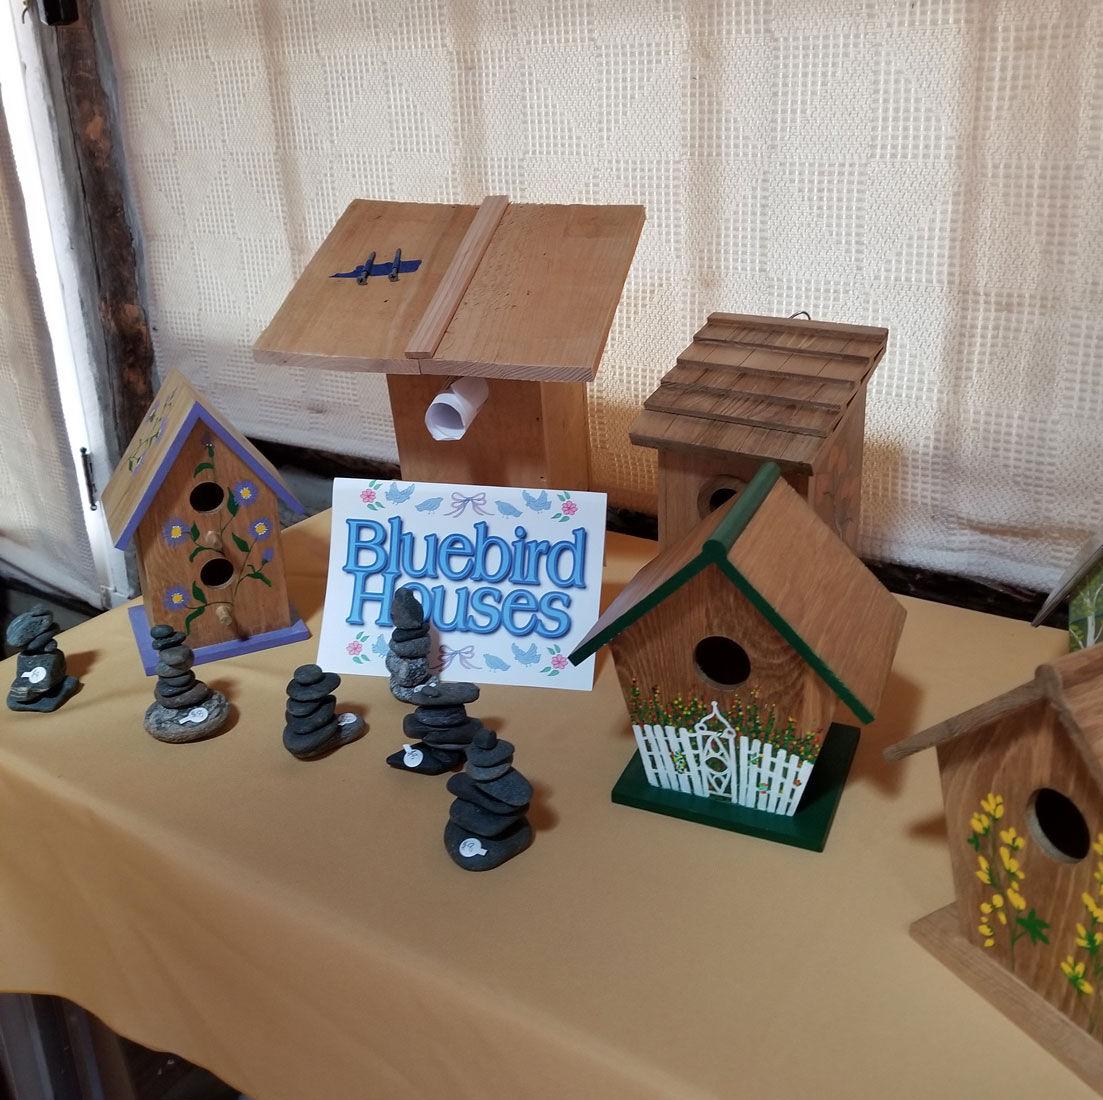 Allenspark Hilltop Guild Hosts Second Saturday Mini Bazaar